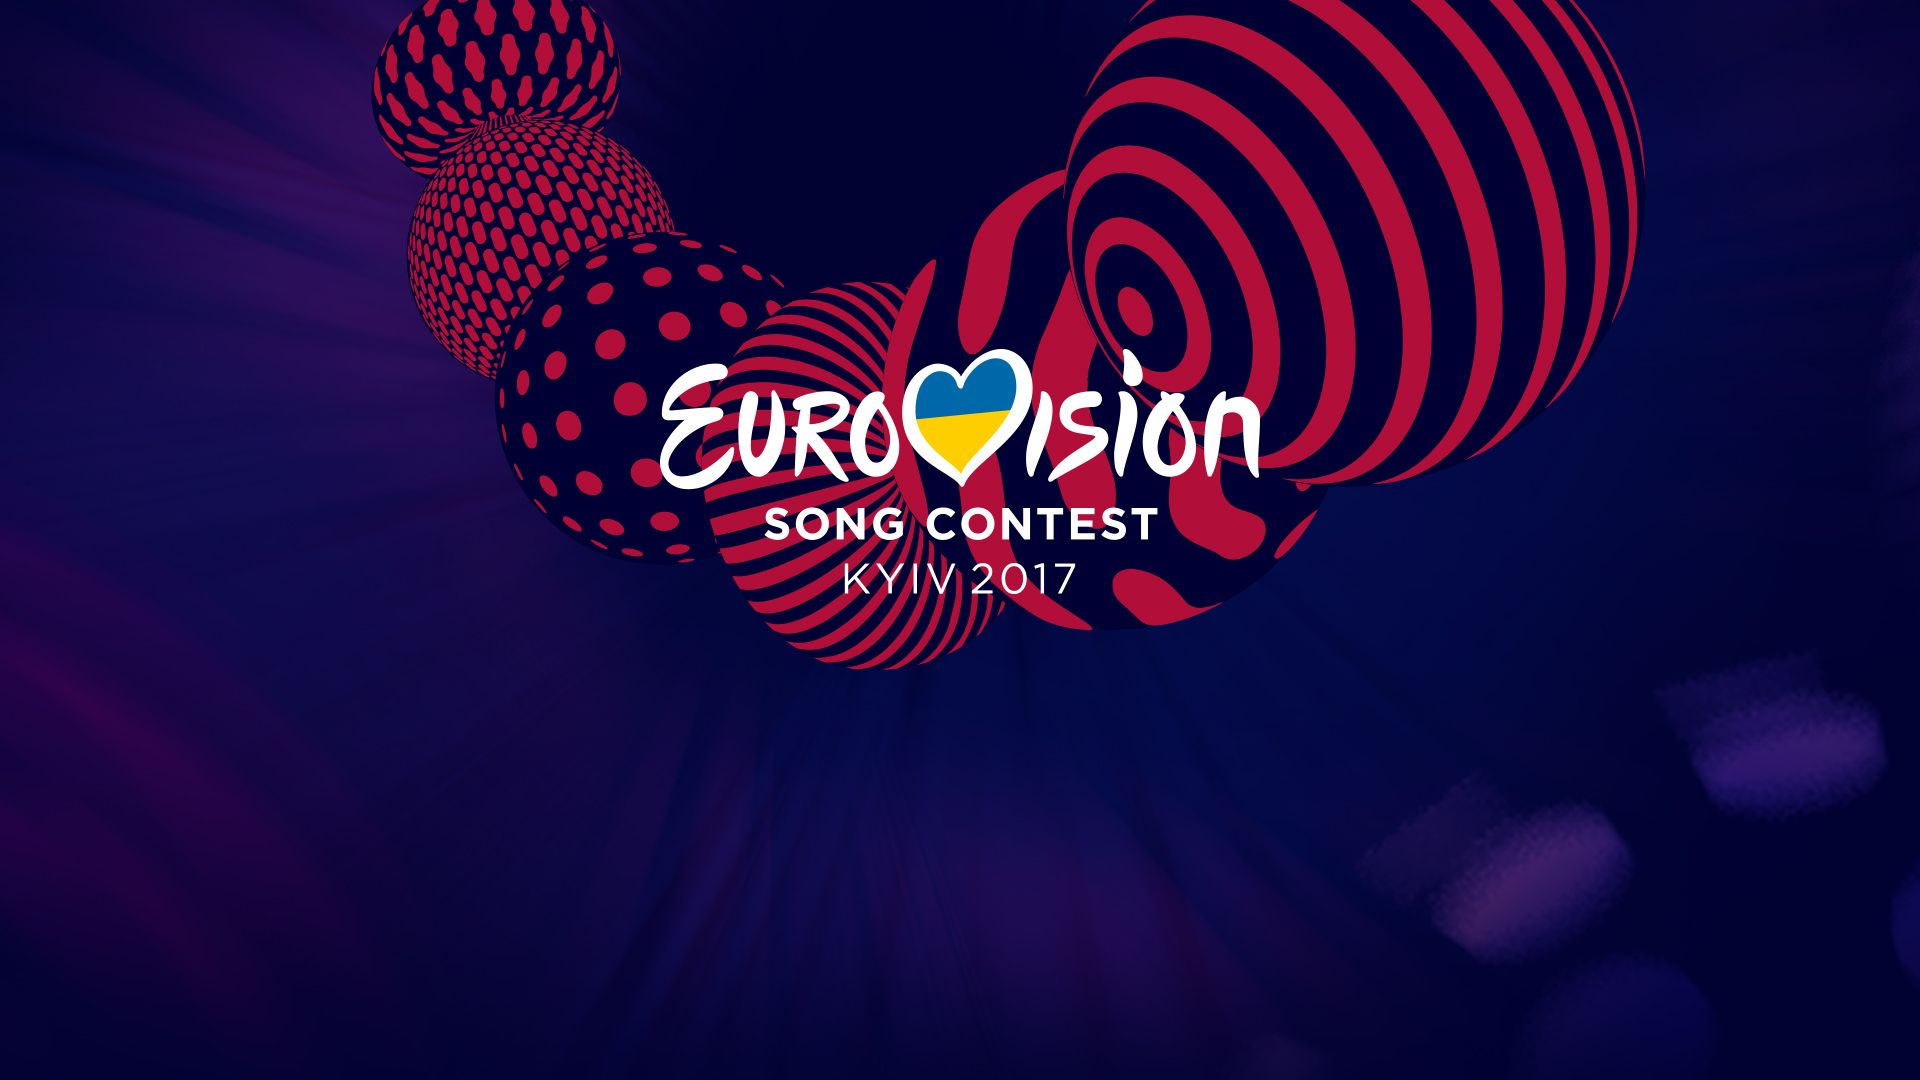 Resultado de imagen de eurovision 2017 logo